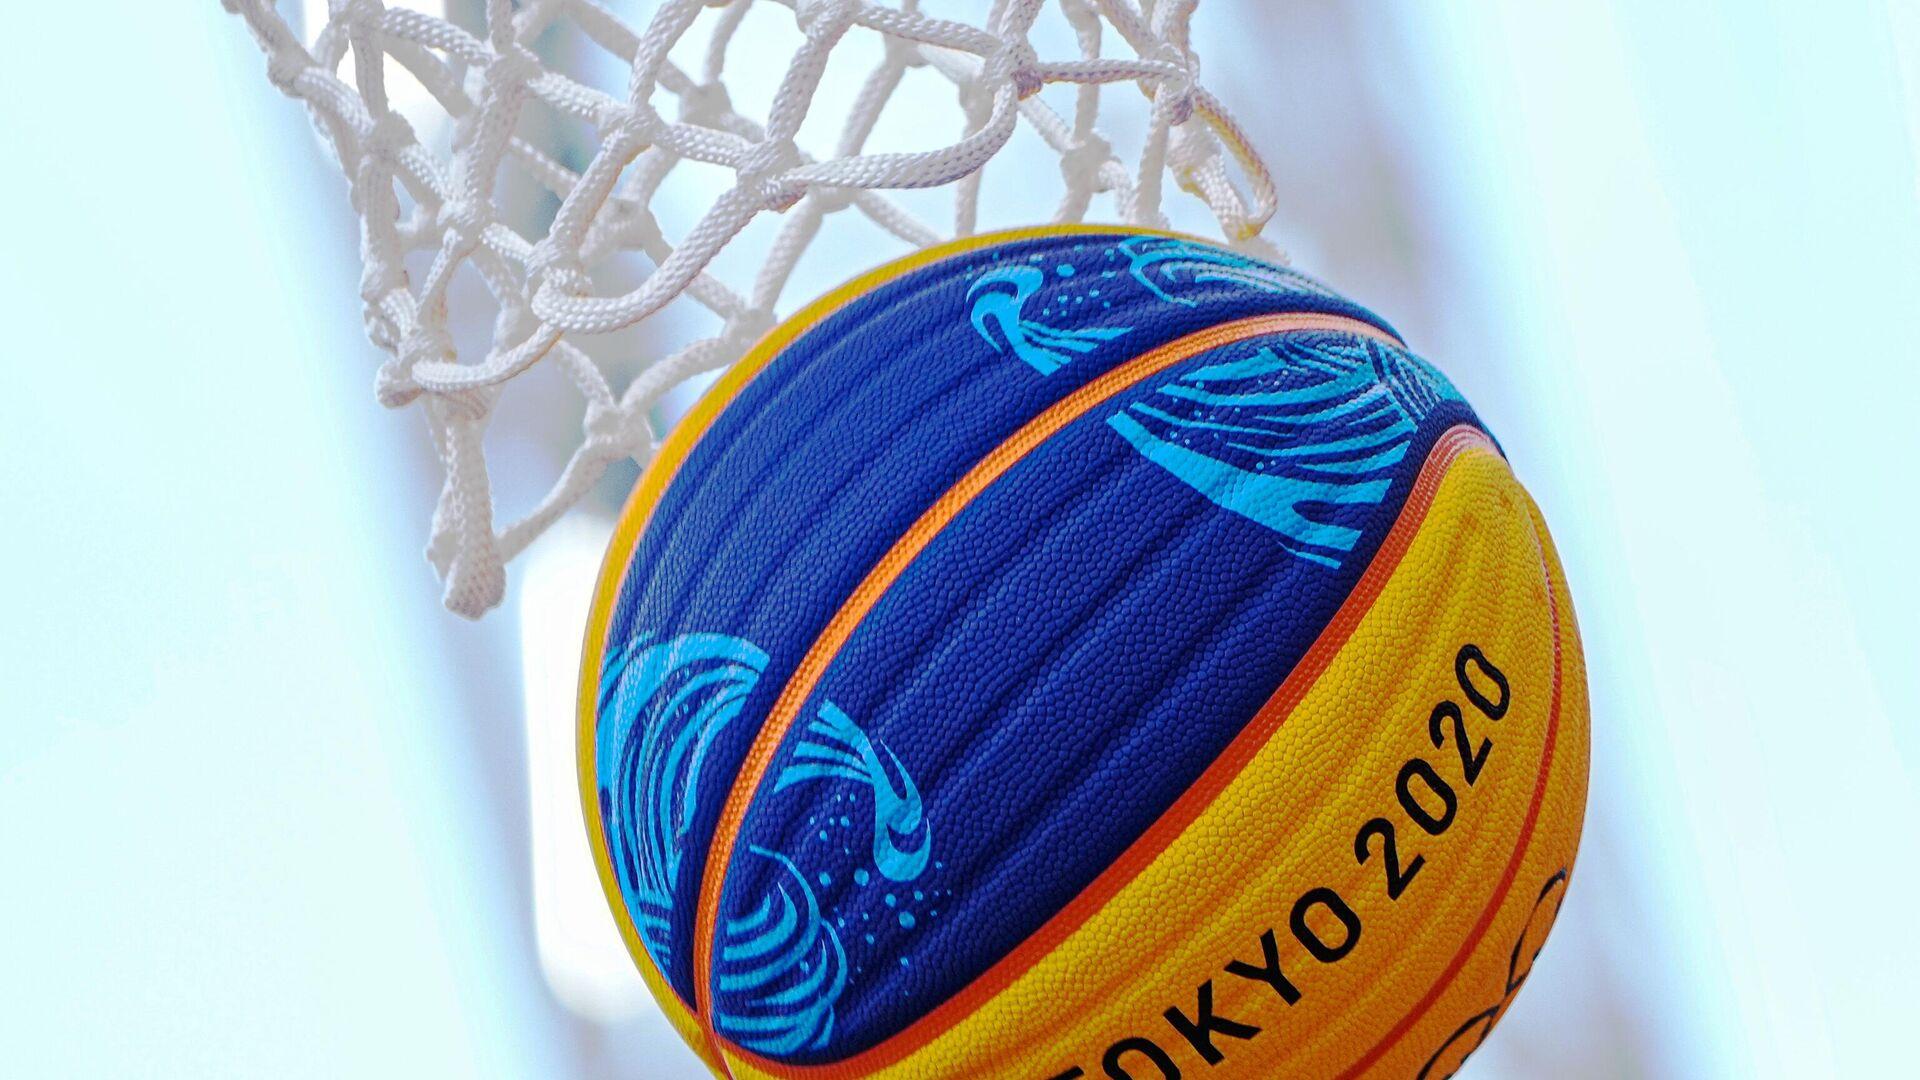 Олимпиада-2020. Баскетбол 3х3. Женщины. Матч Россия - Япония - РИА Новости, 1920, 25.07.2021